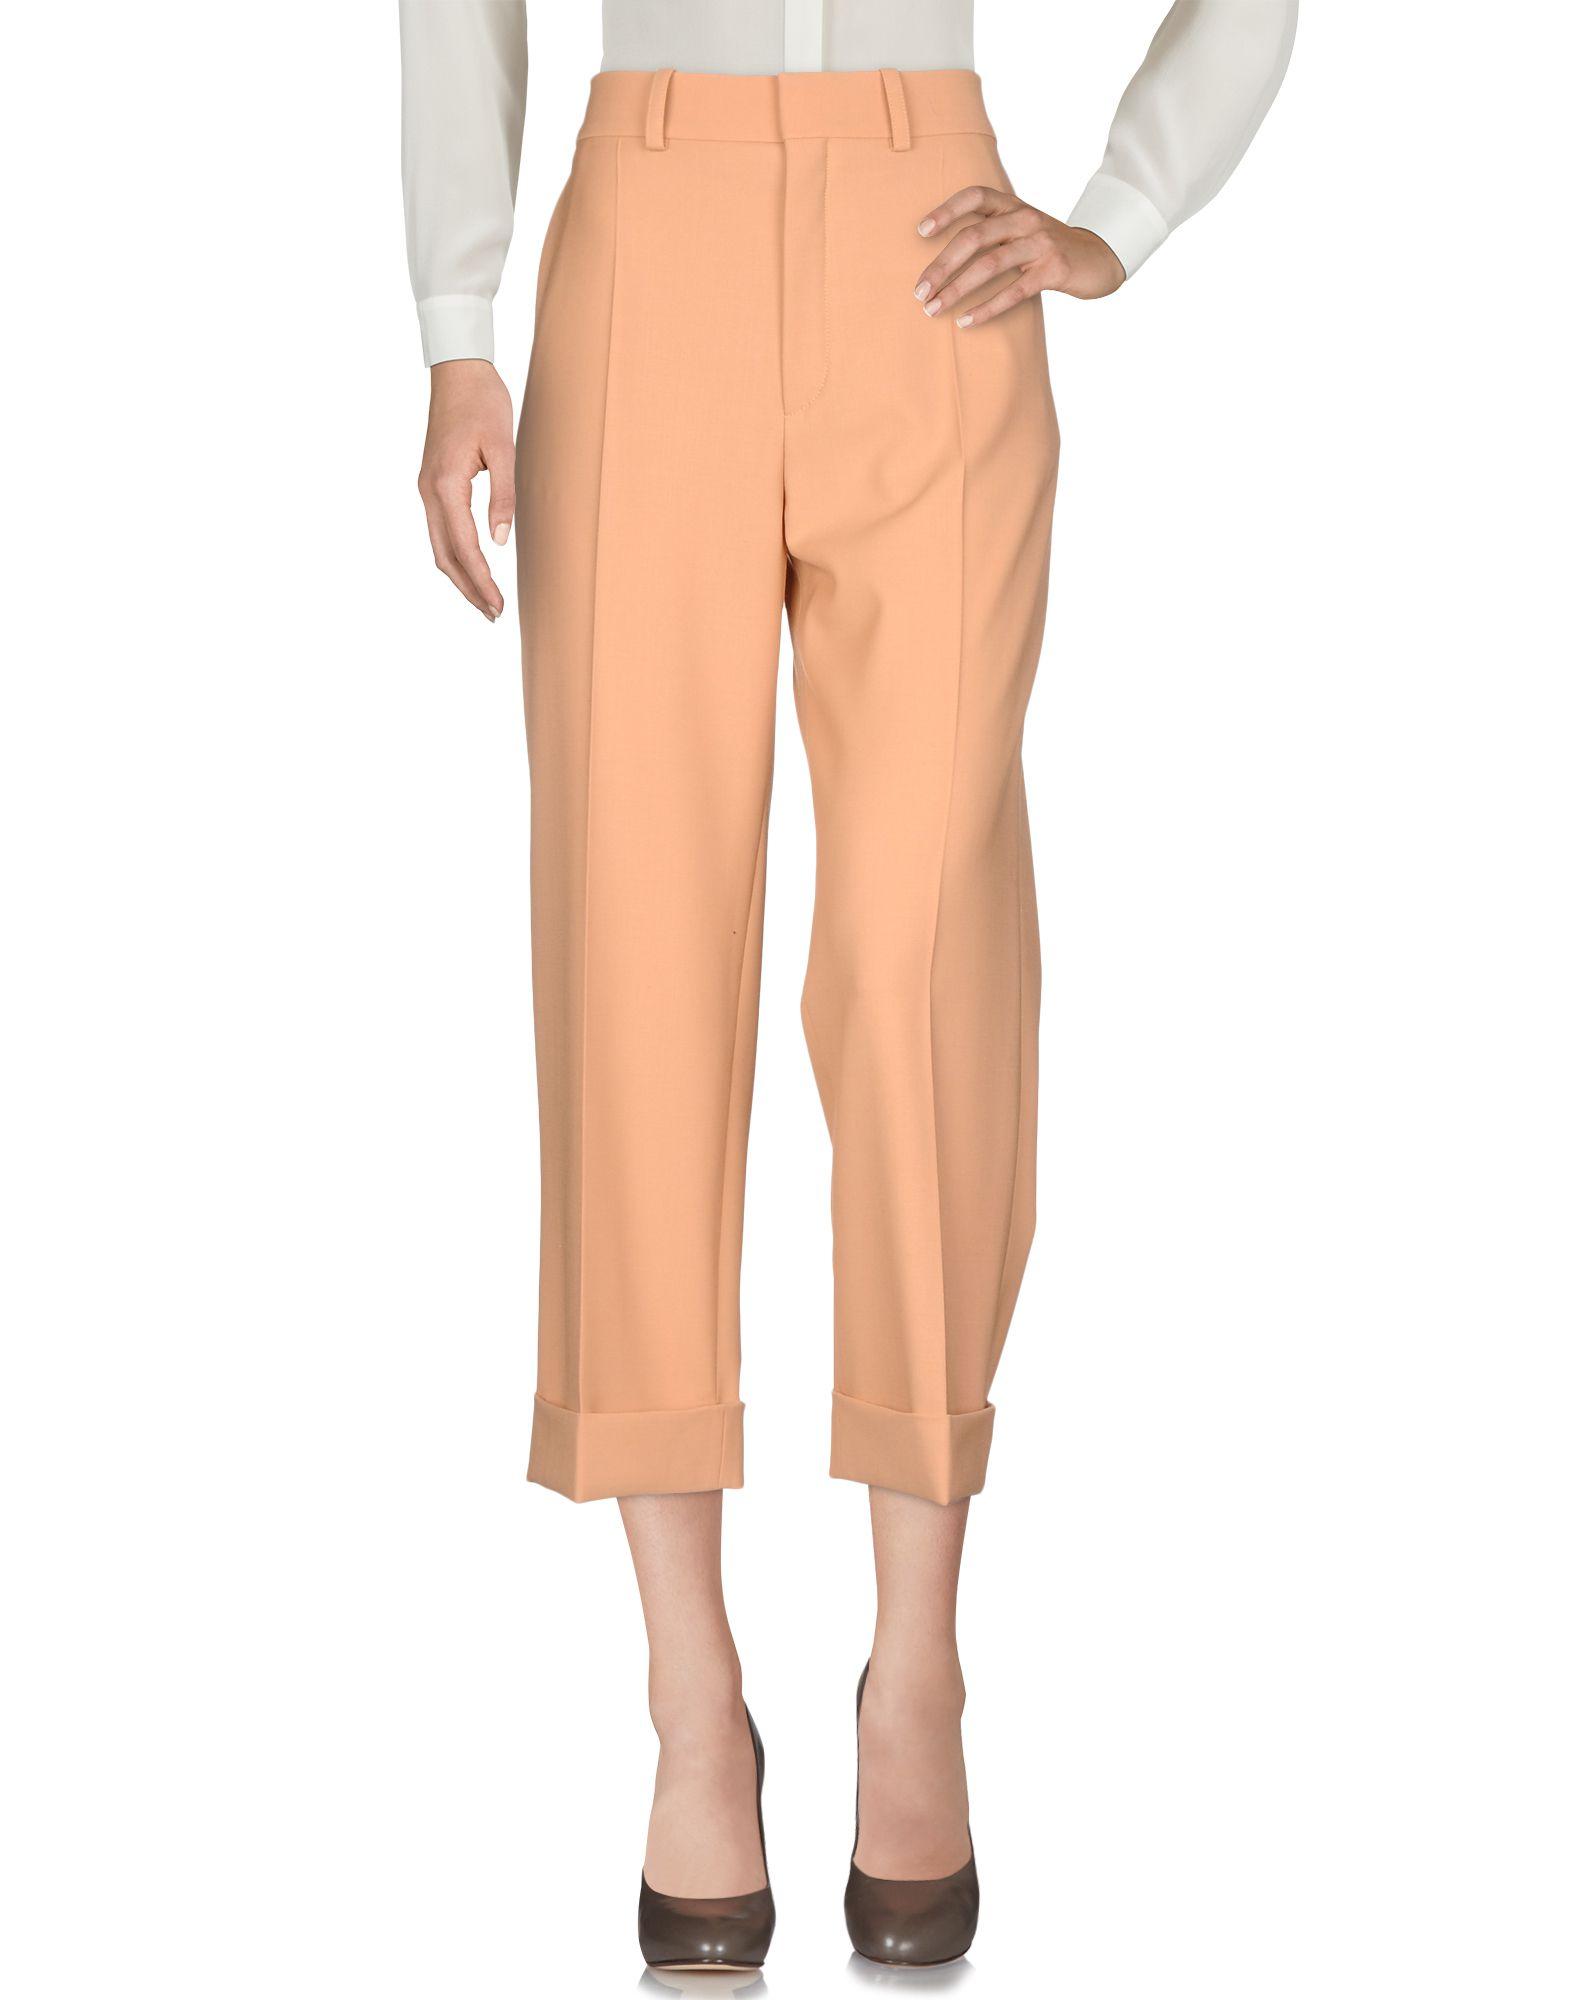 Pantalone Chloé Chloé donna - 13182165QS  praktisch